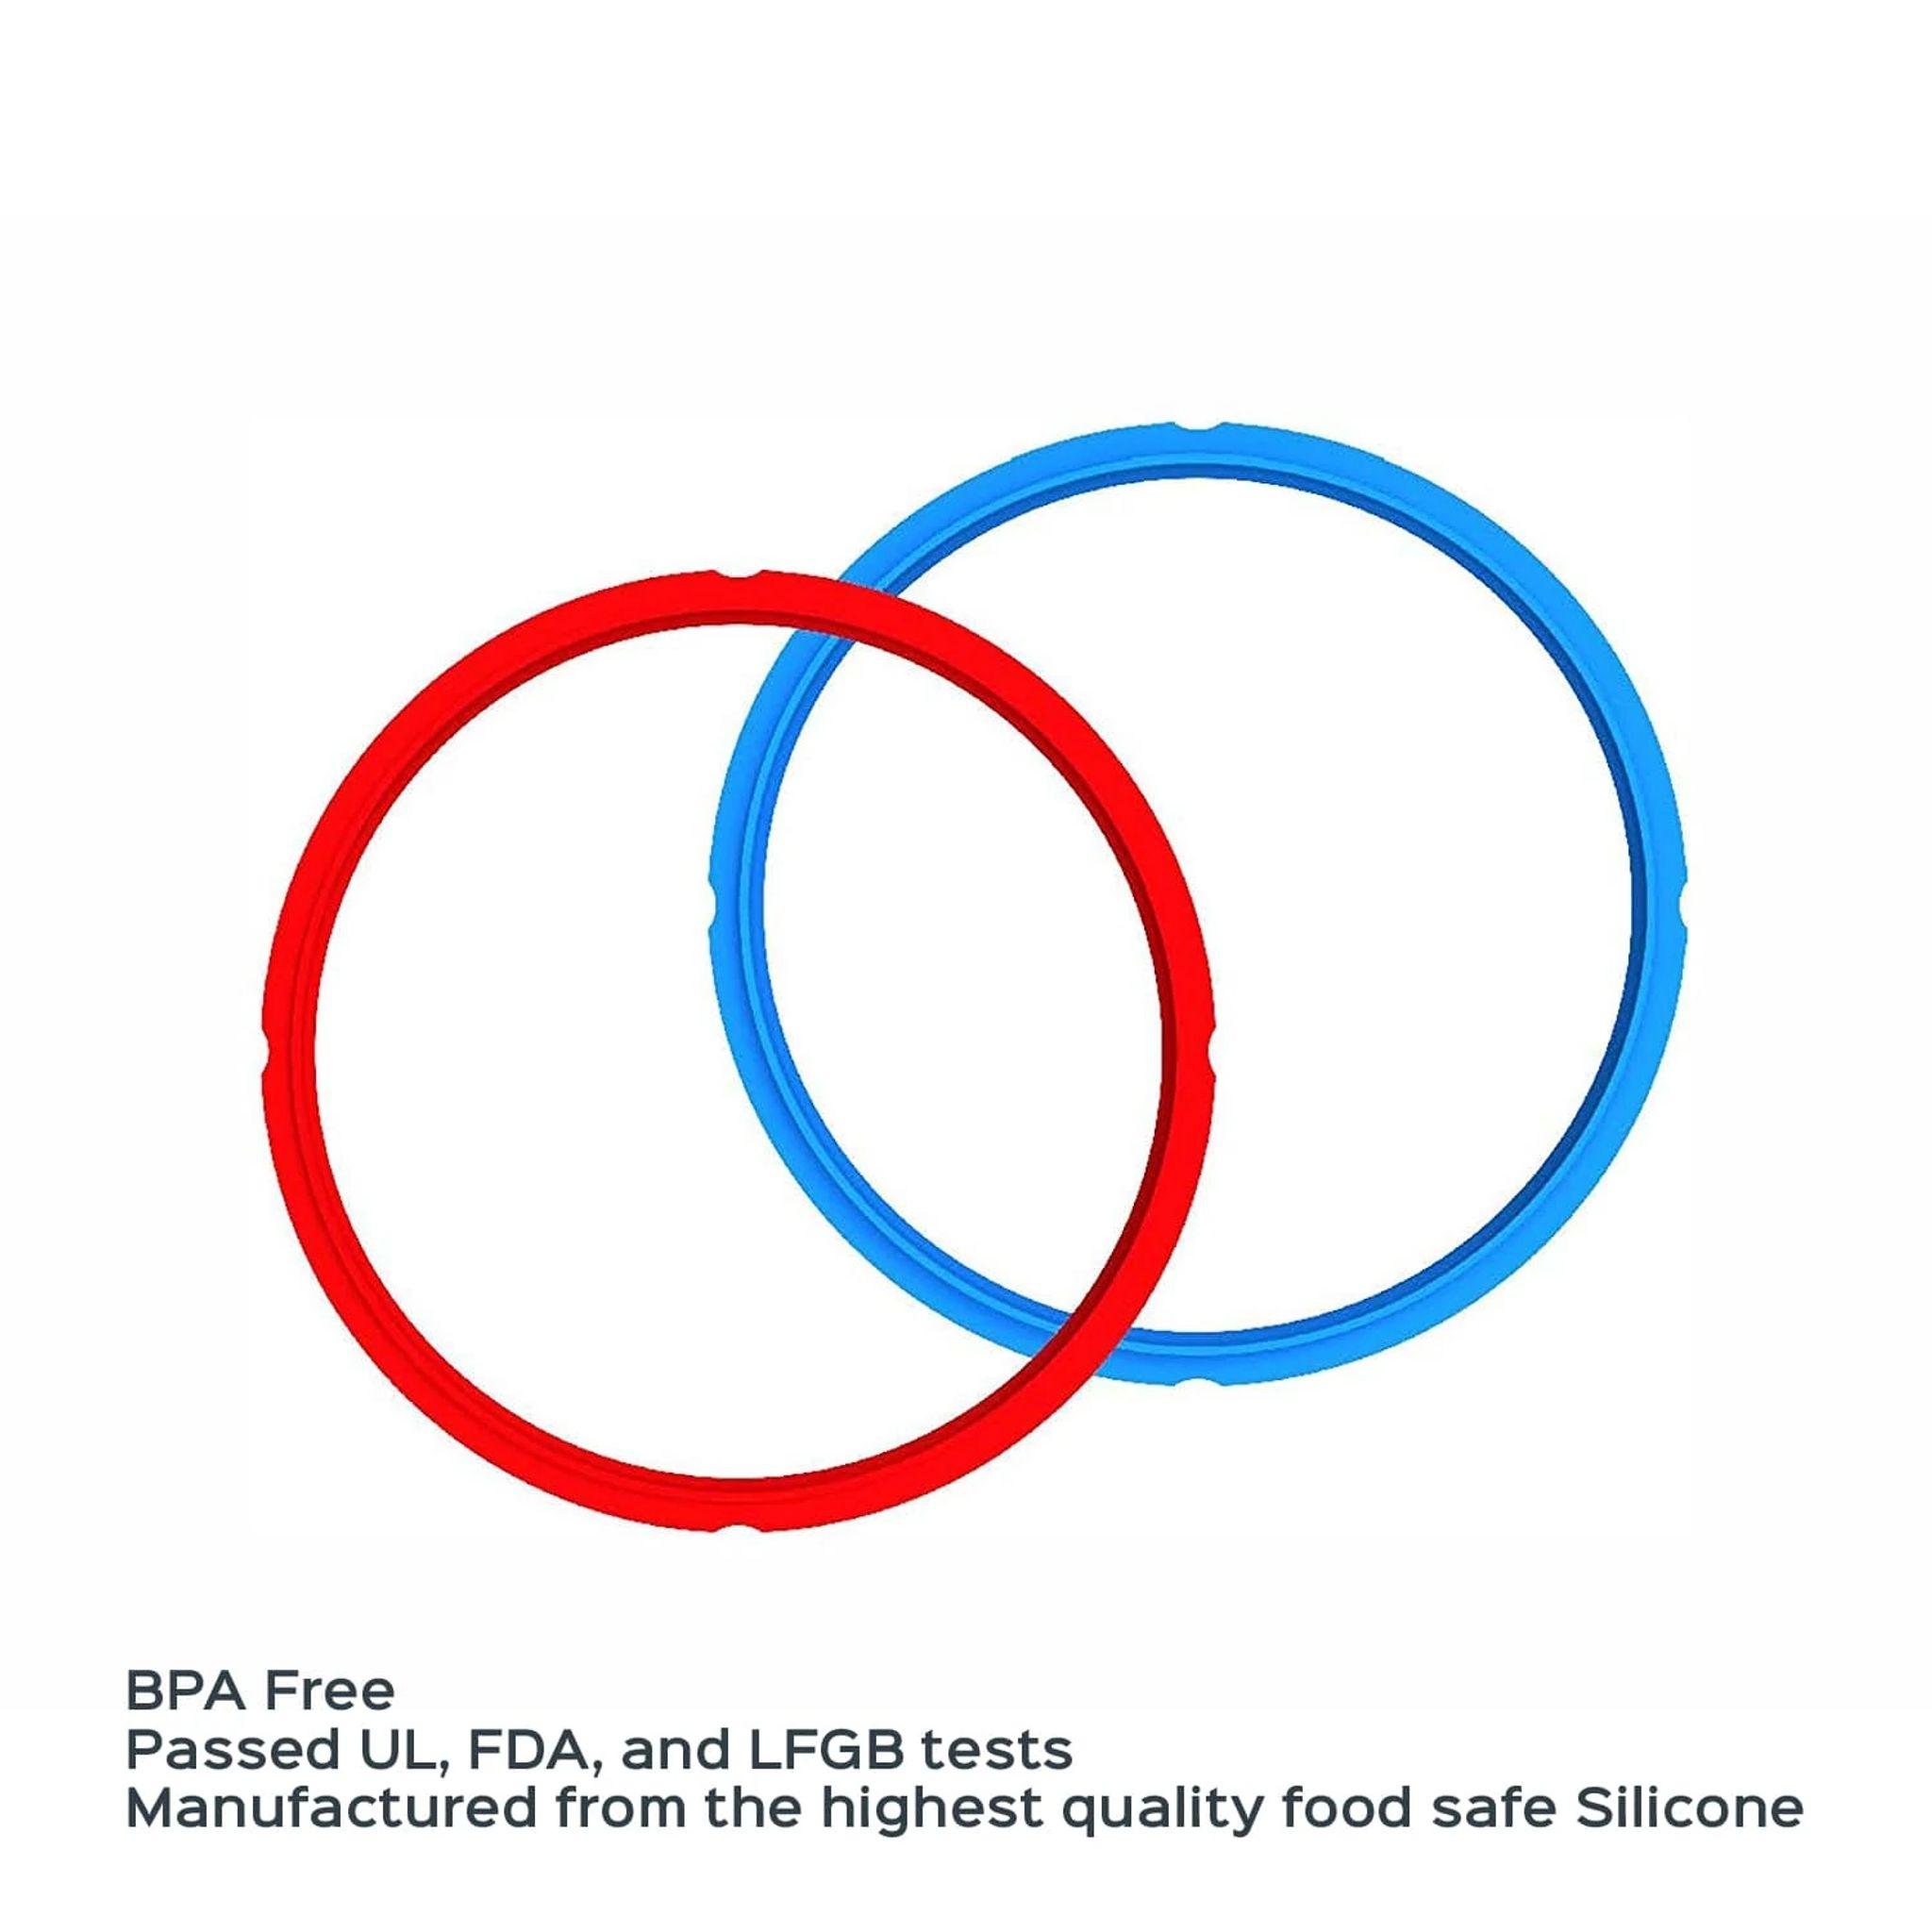 Instant Pot 3-quart Colour Sealing Ring, 2-pack